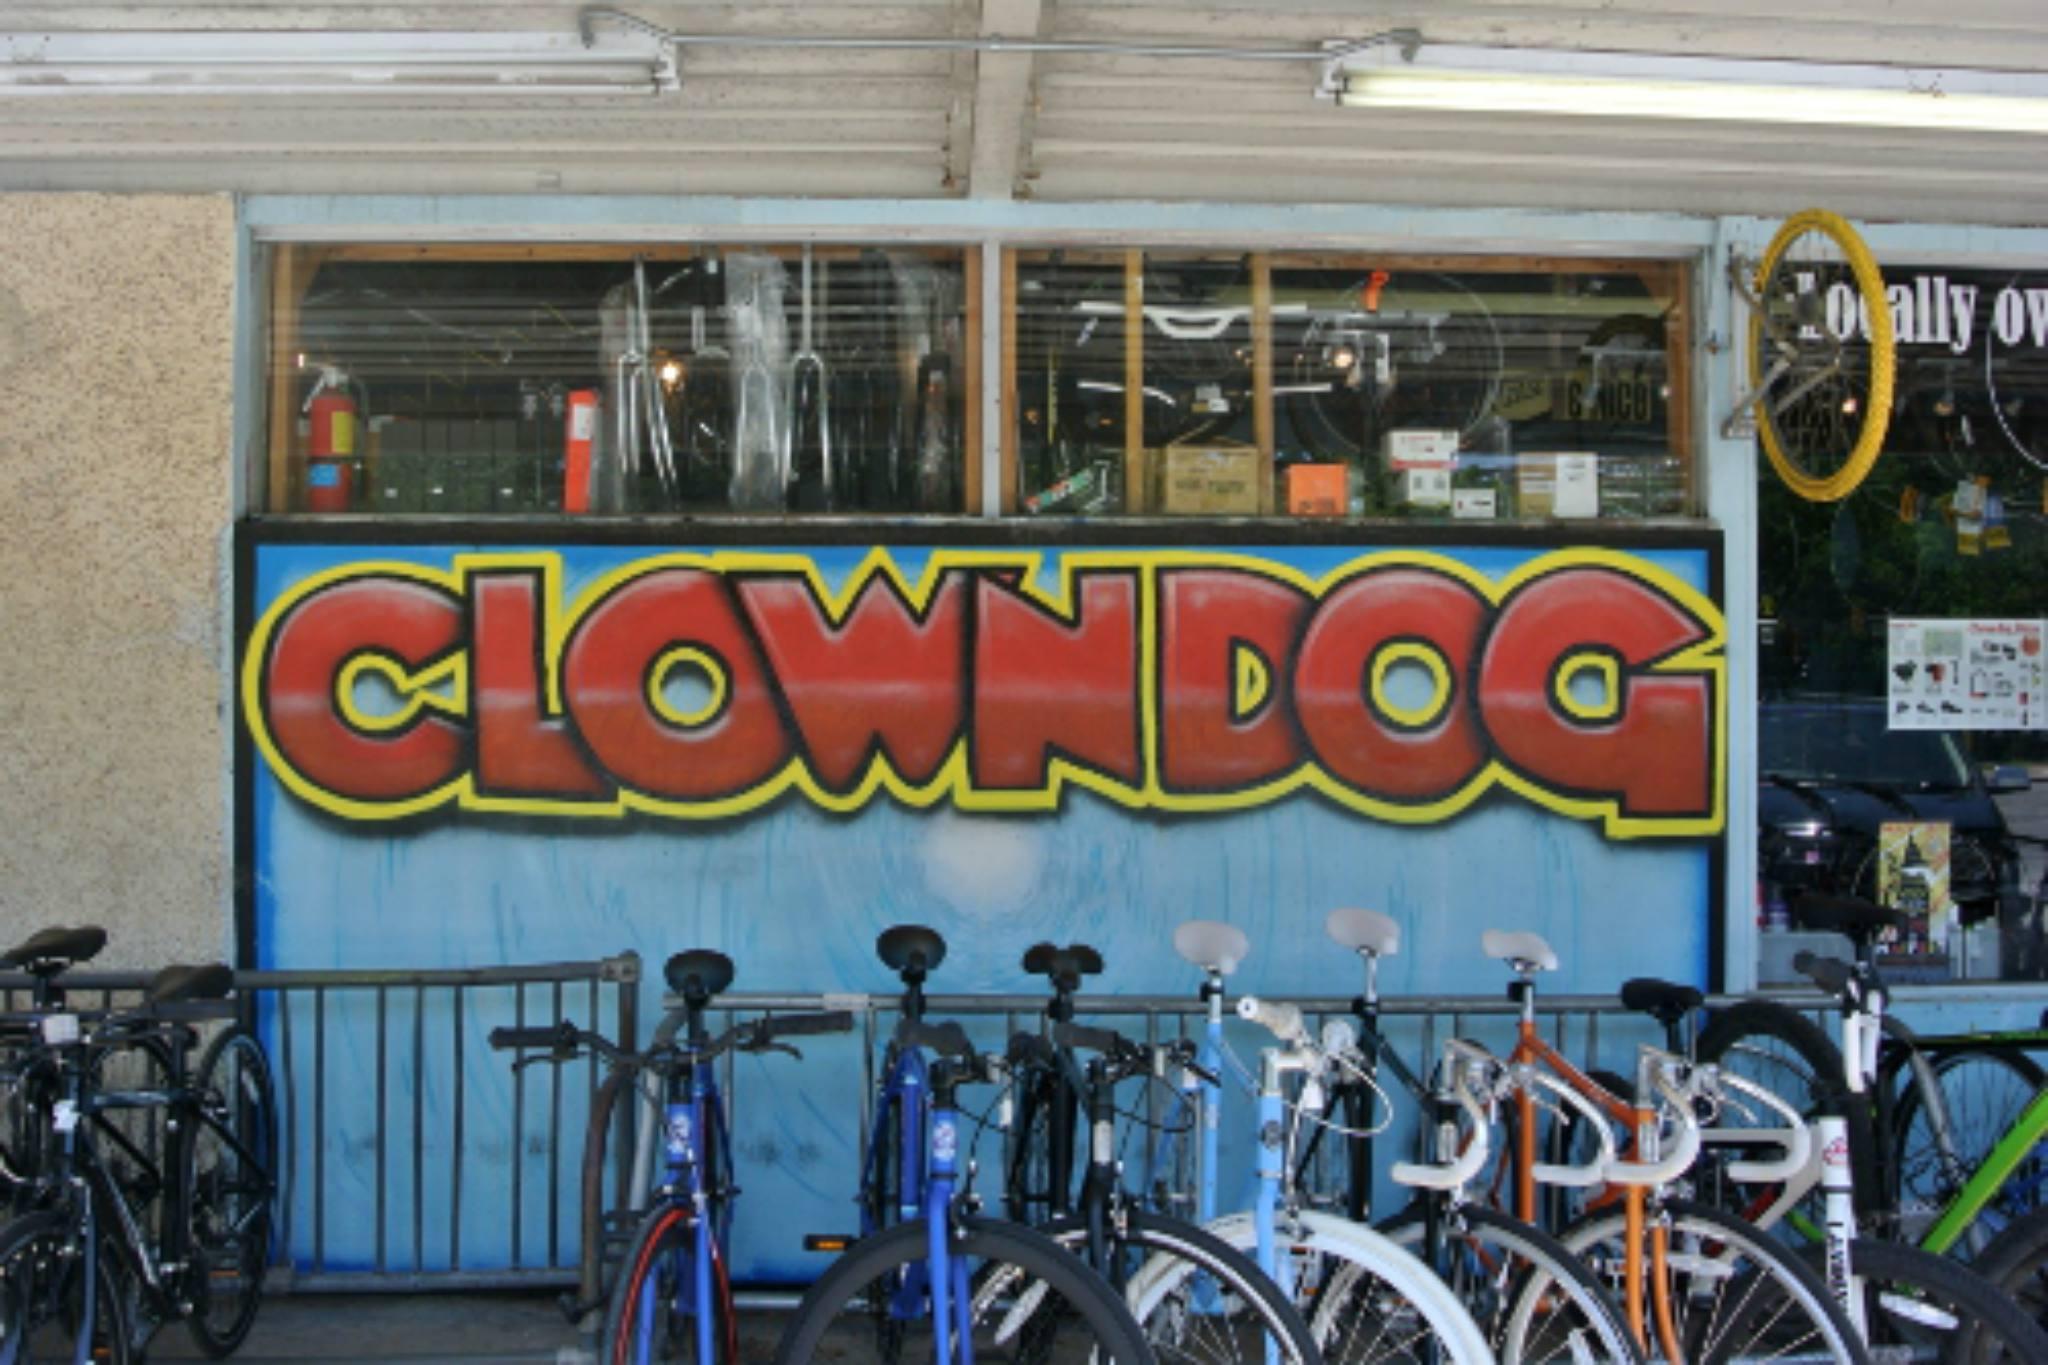 Clown Dog Bikes